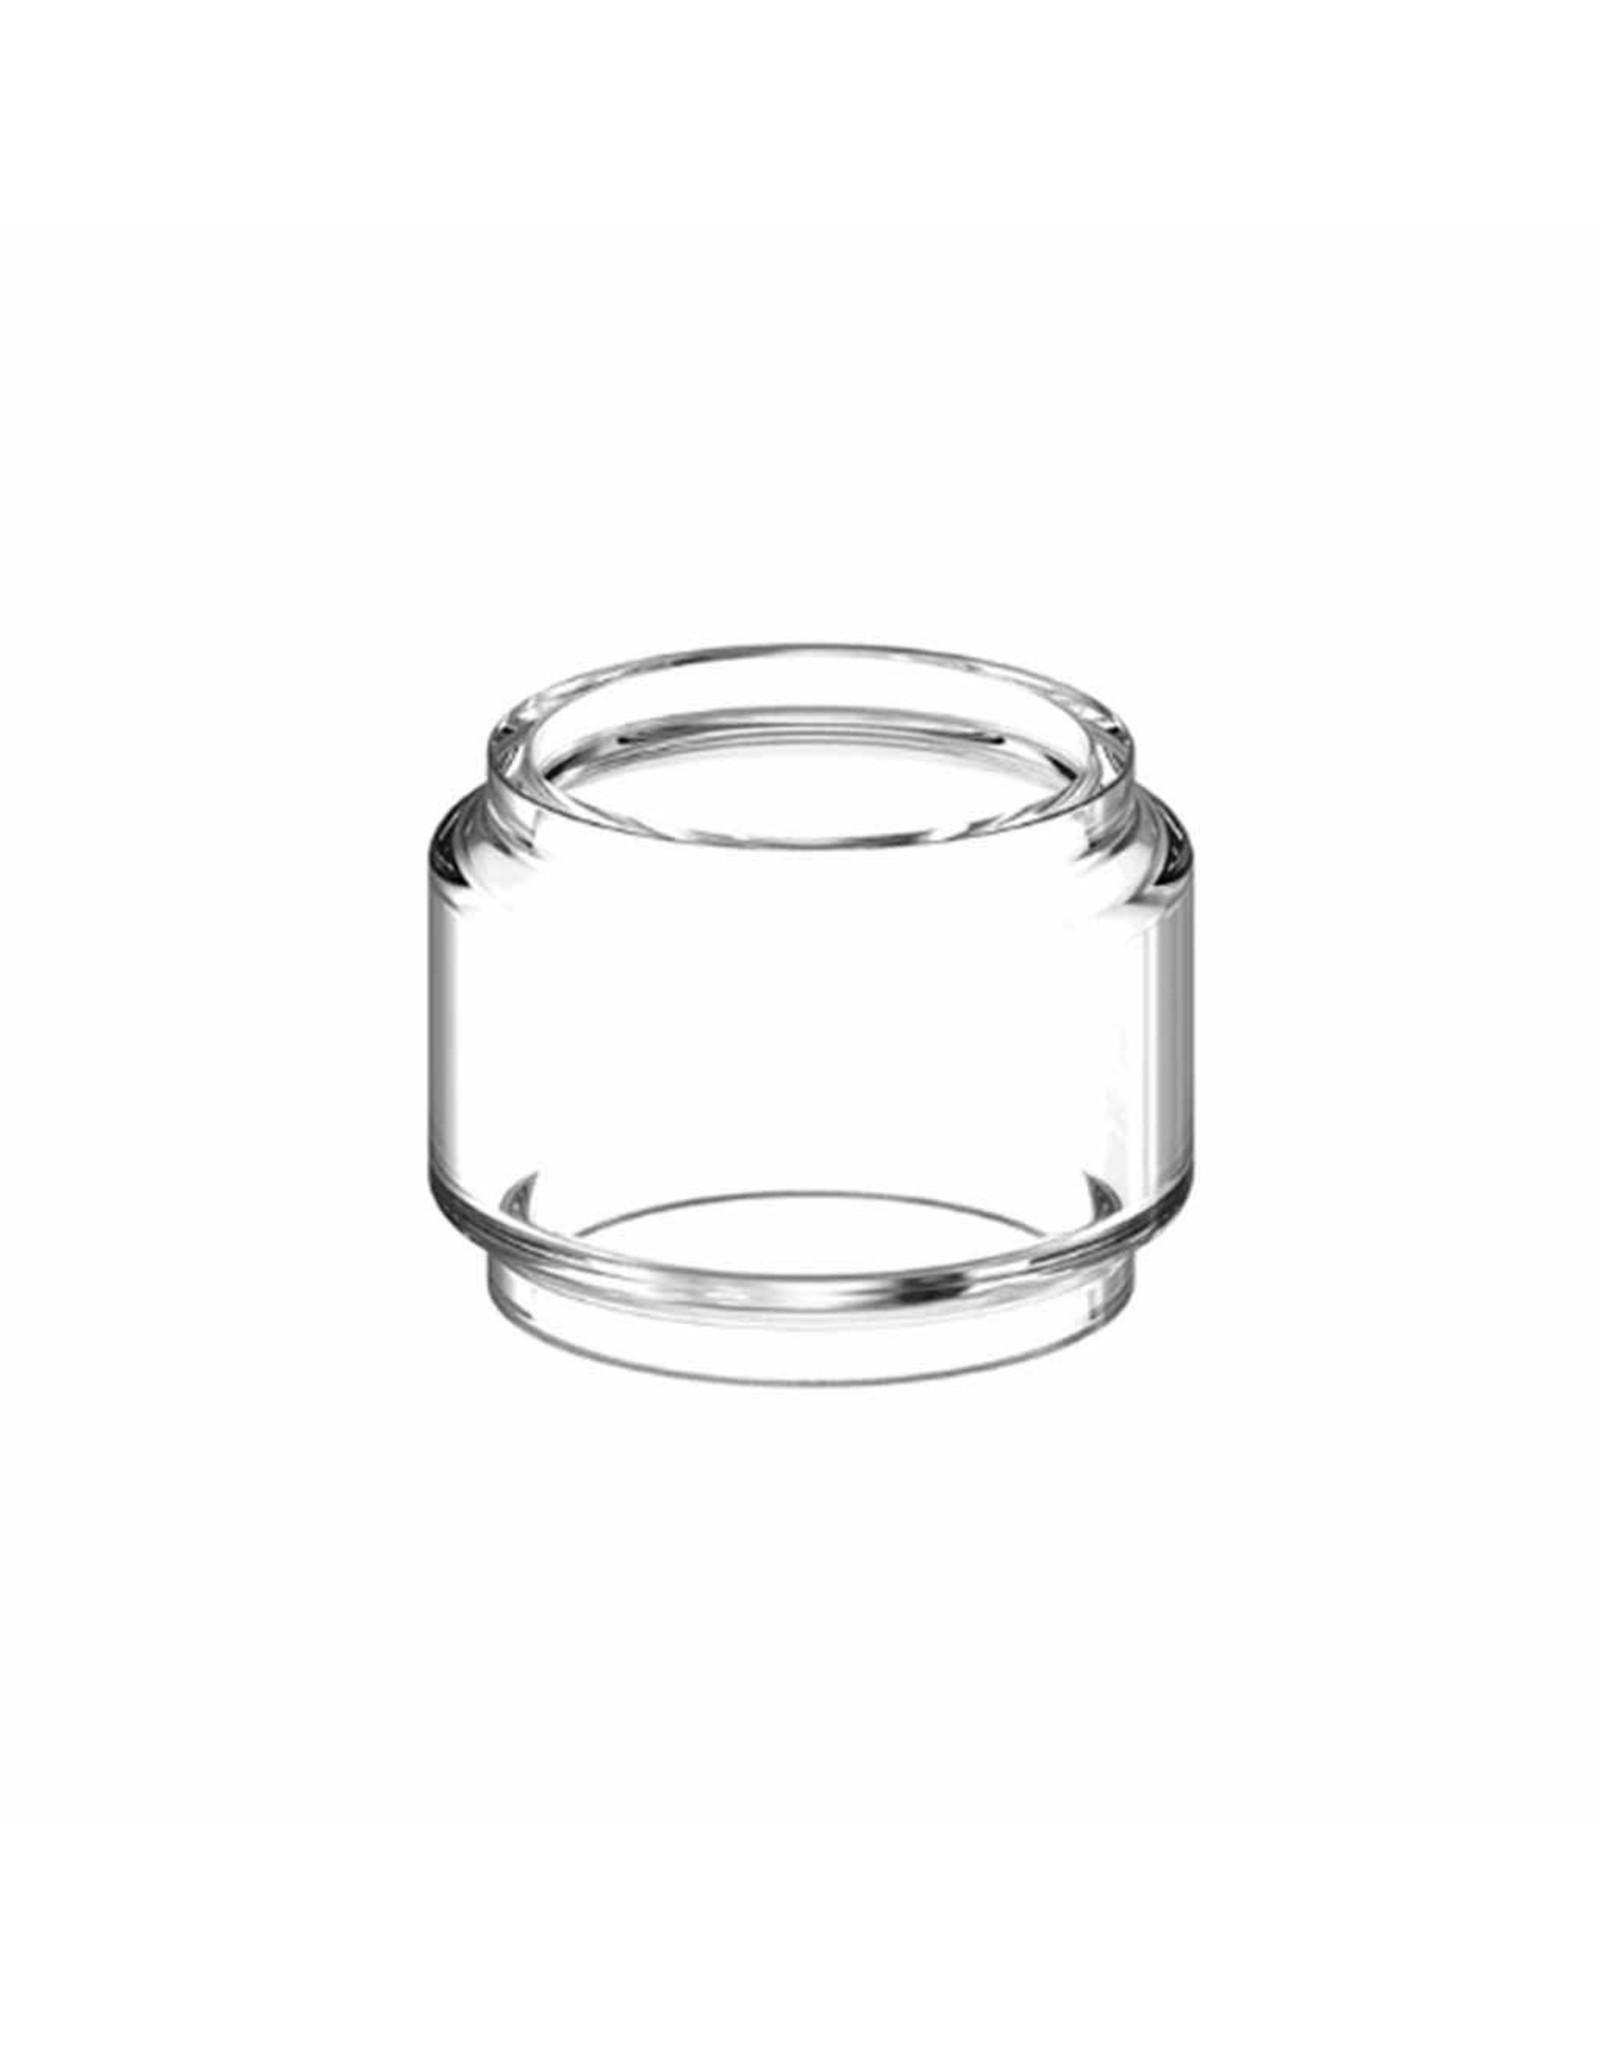 HorizonTech HorizonTech Falcon Replacement Bubble Glass